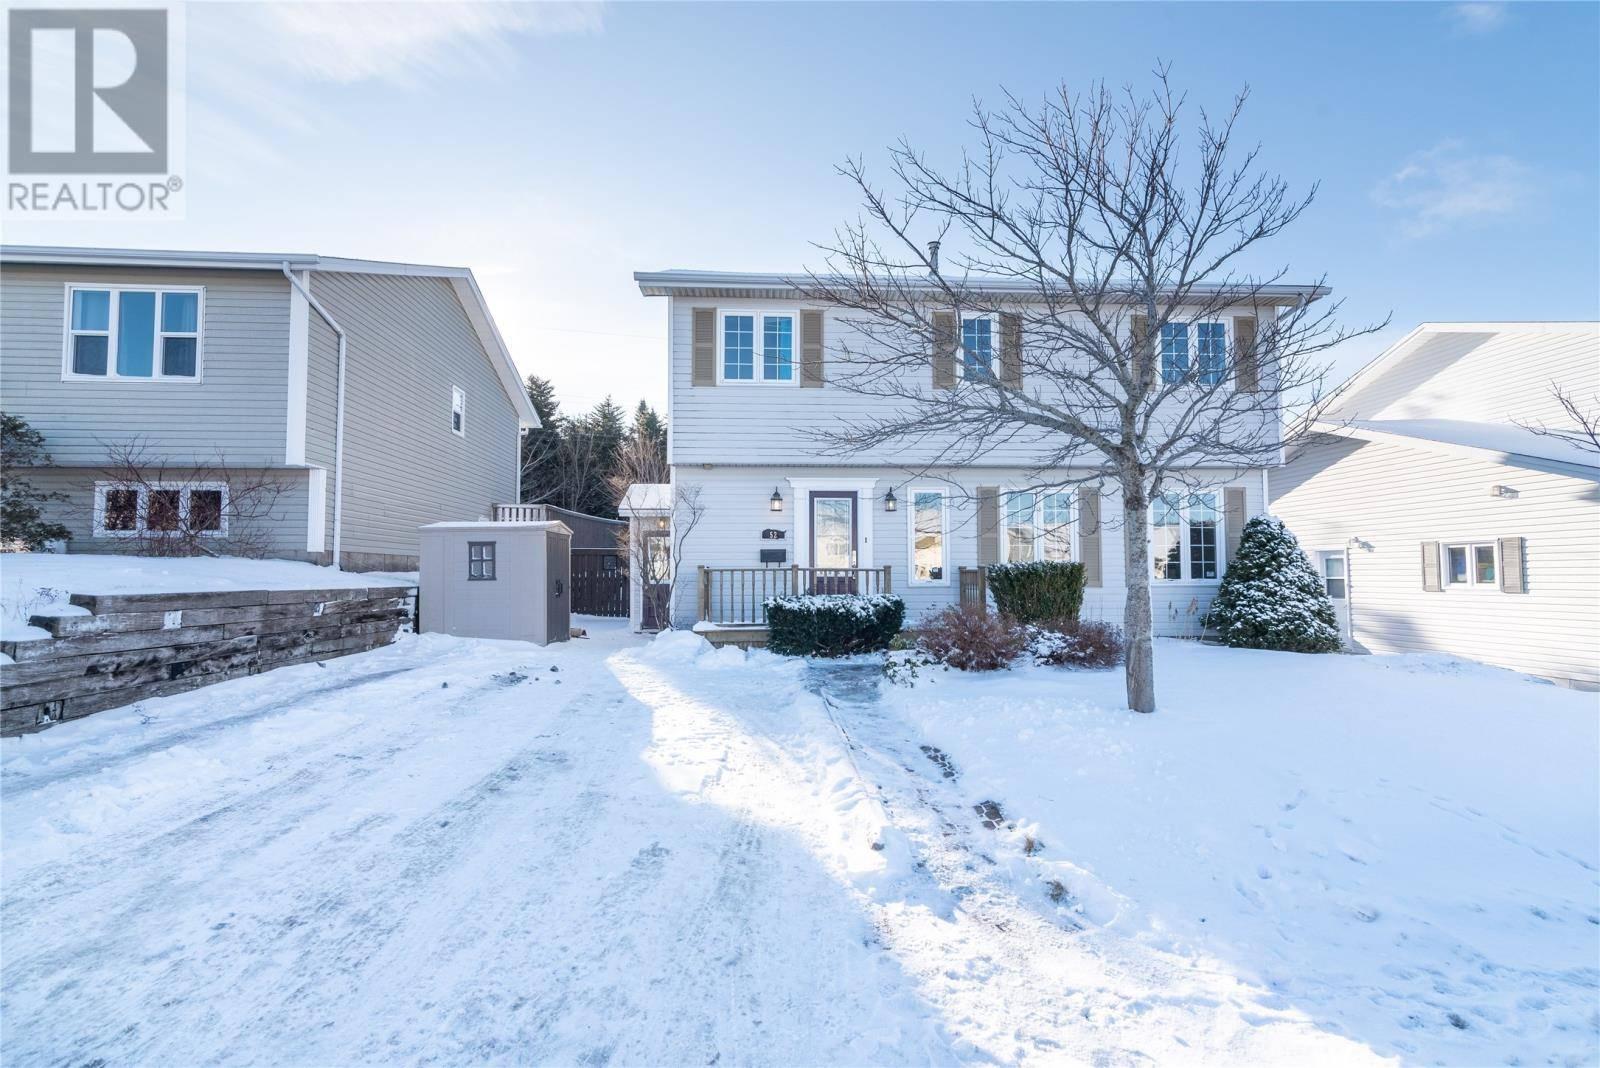 House for sale at 52 Harrington Dr St. John's Newfoundland - MLS: 1209148